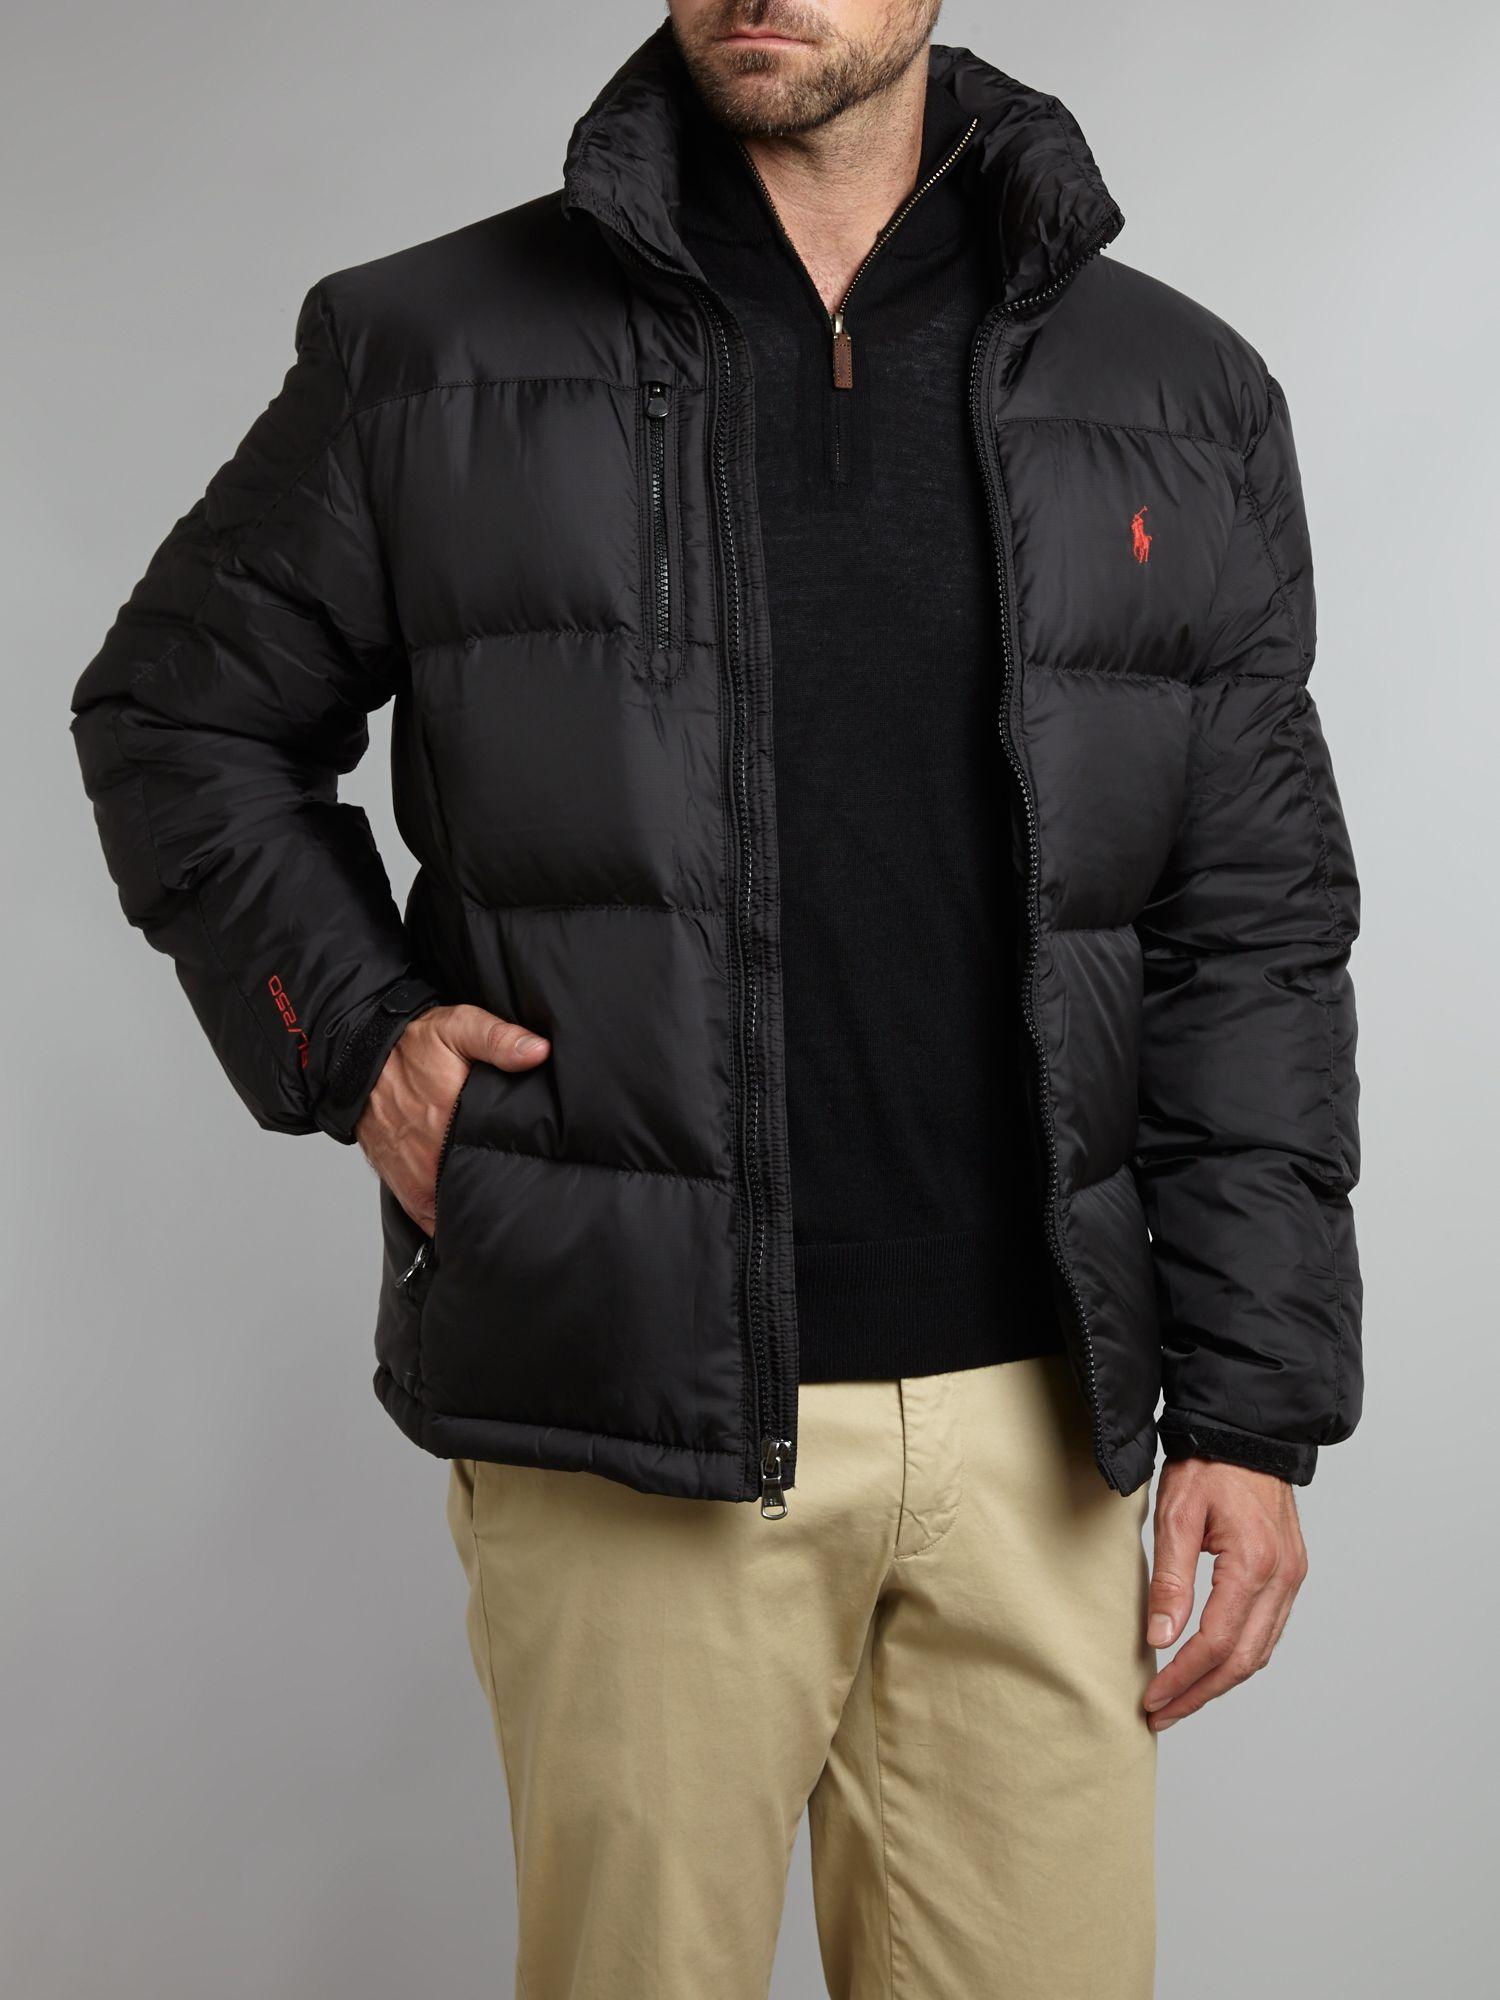 polo ralph lauren core trek padded jacket in black for men lyst. Black Bedroom Furniture Sets. Home Design Ideas